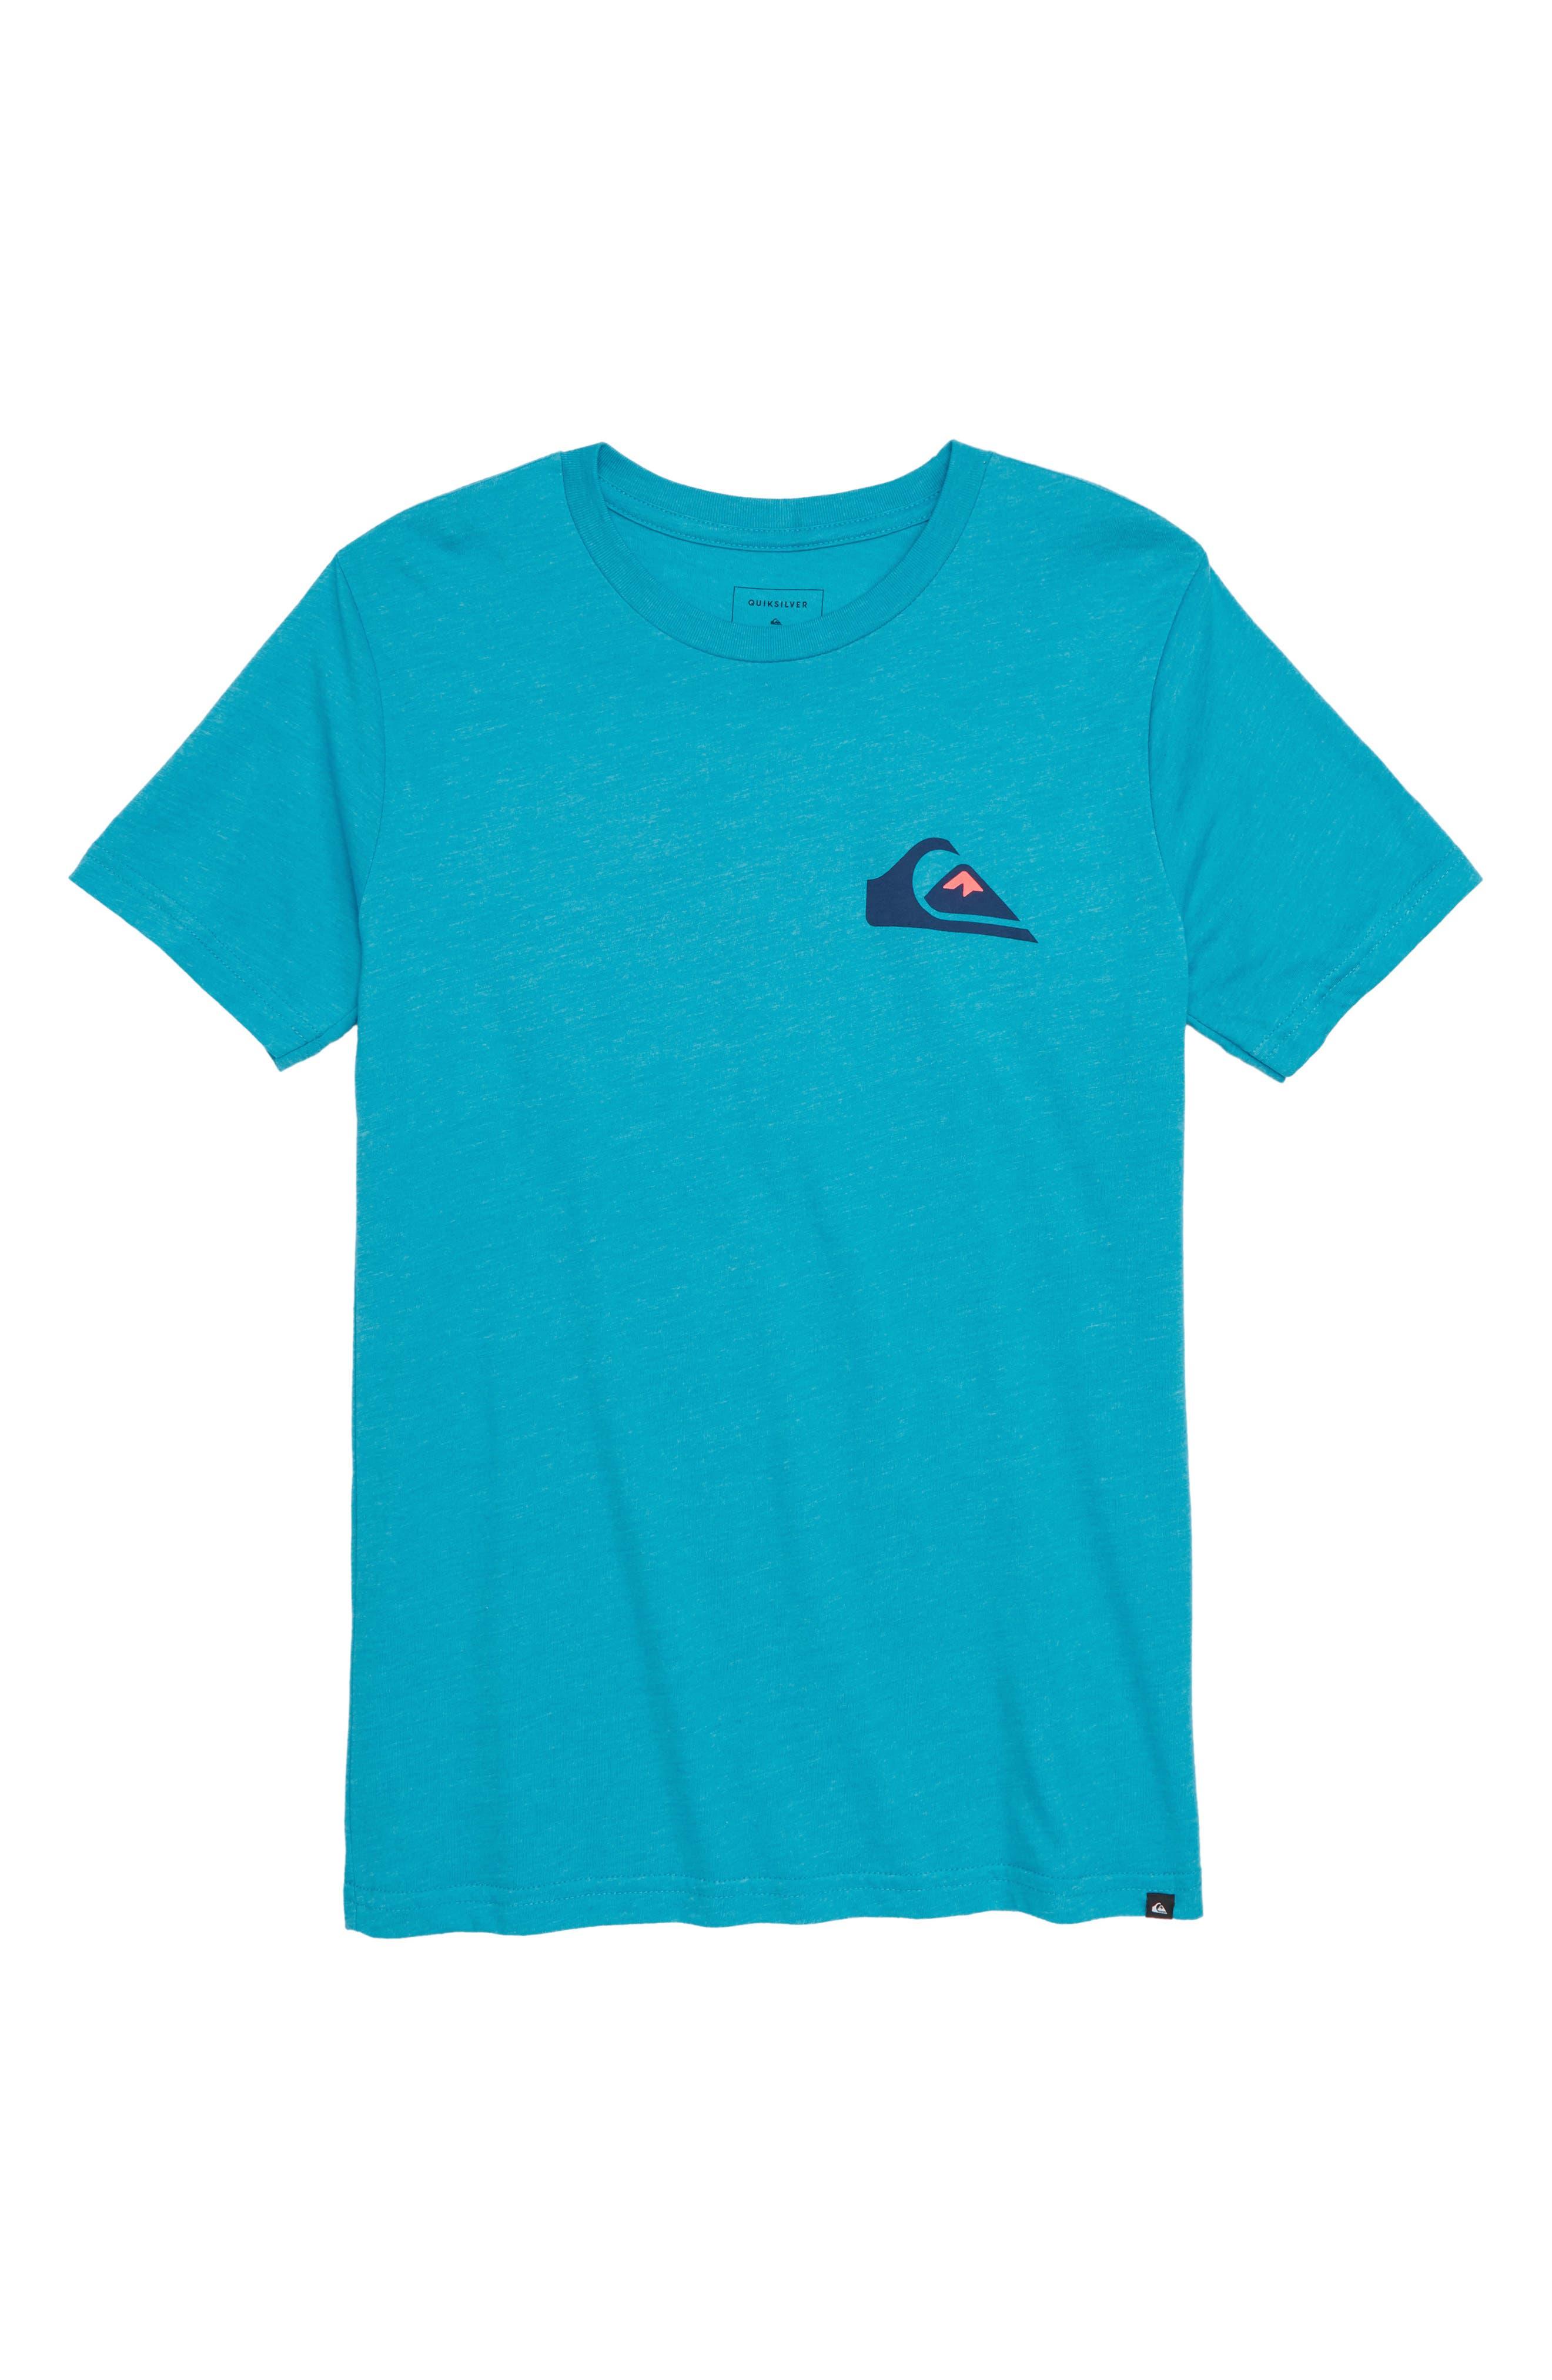 Vice Versa Graphic T-Shirt,                             Main thumbnail 1, color,                             437